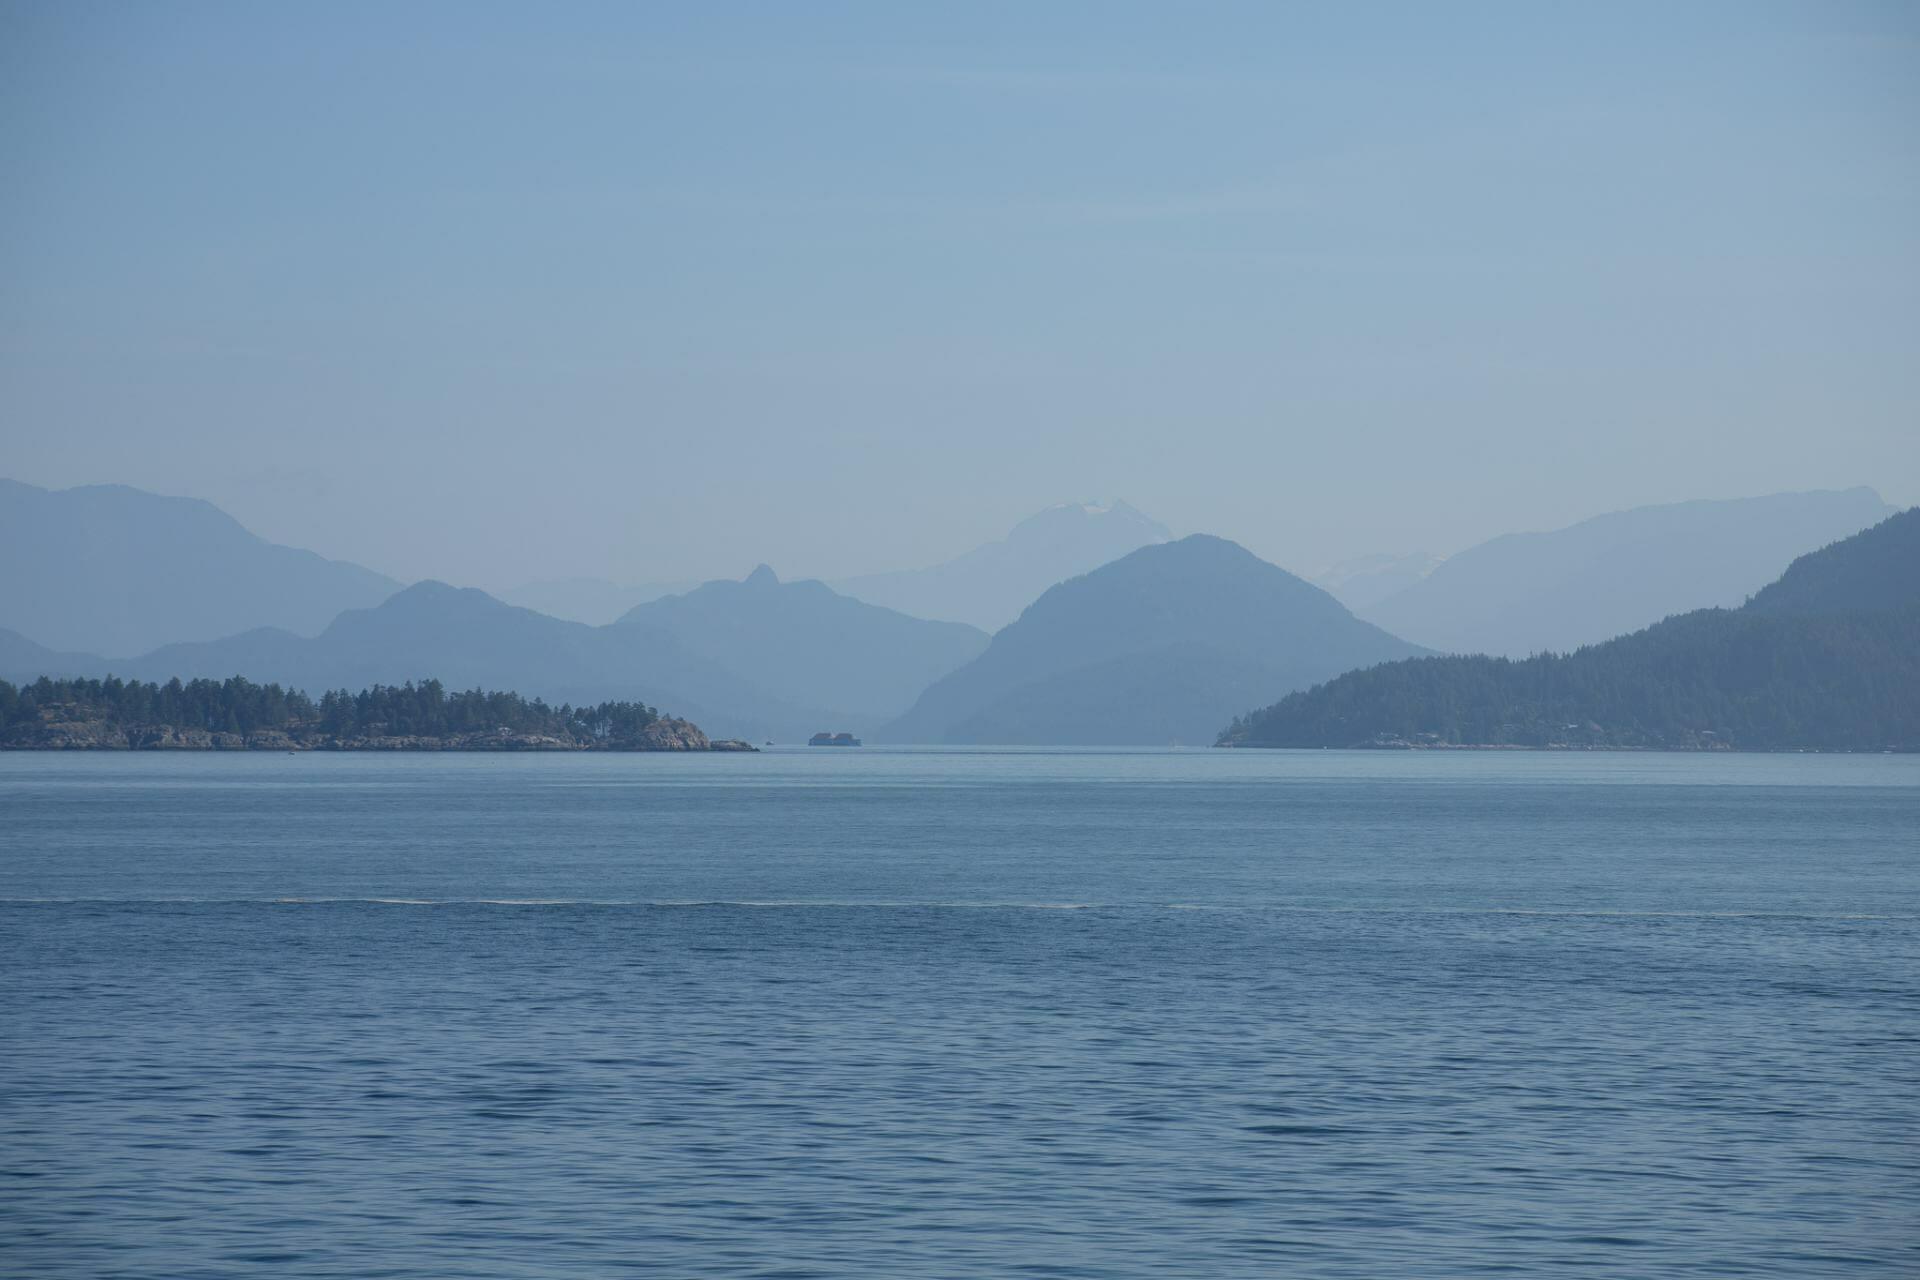 Vancouver to Nanaimo Crossing